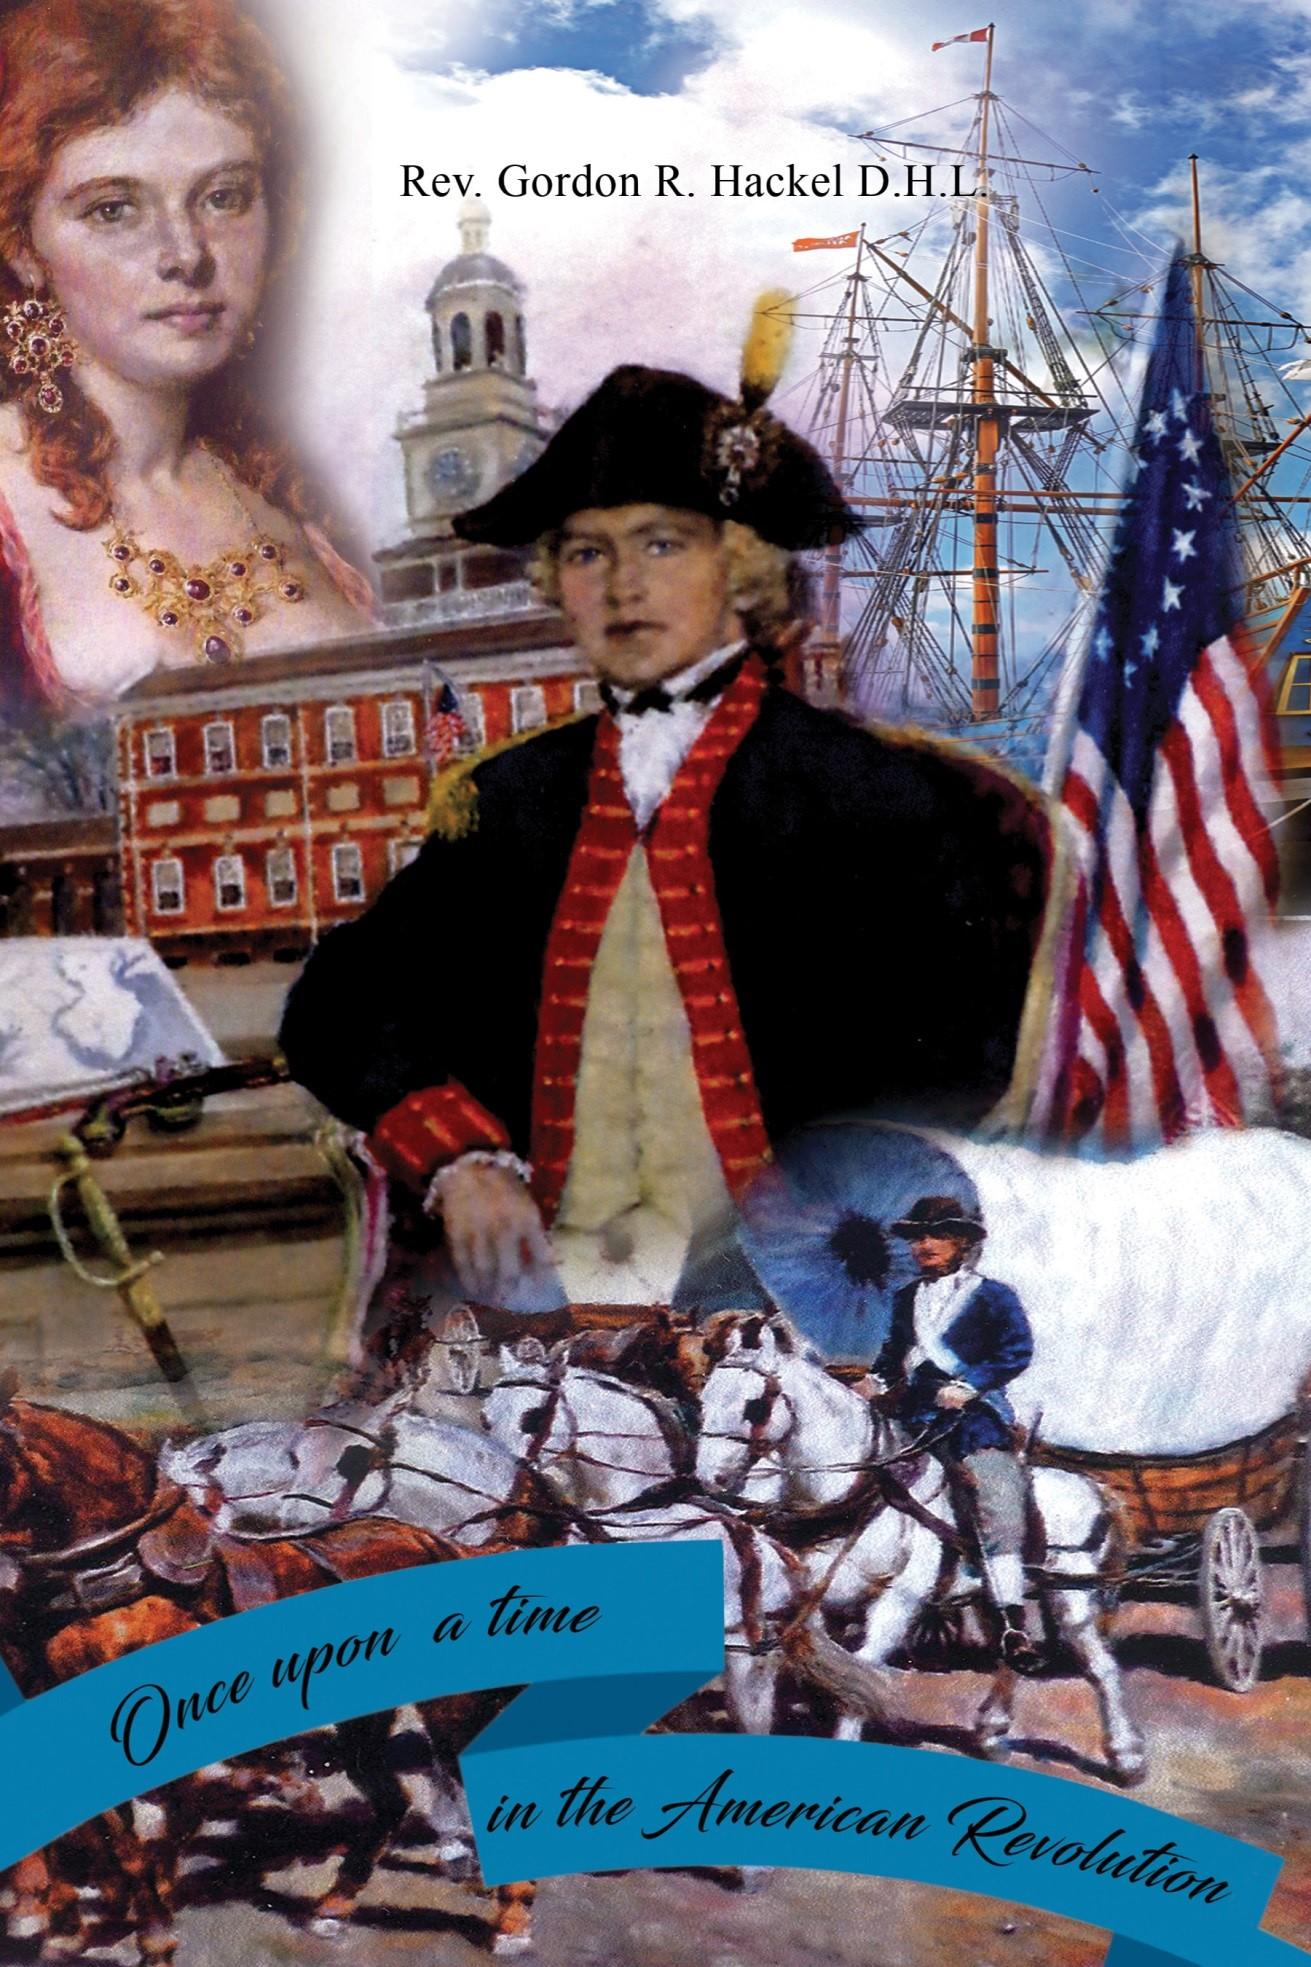 Gordon Hackel's Book Provides Deep Insights on the American Revolution